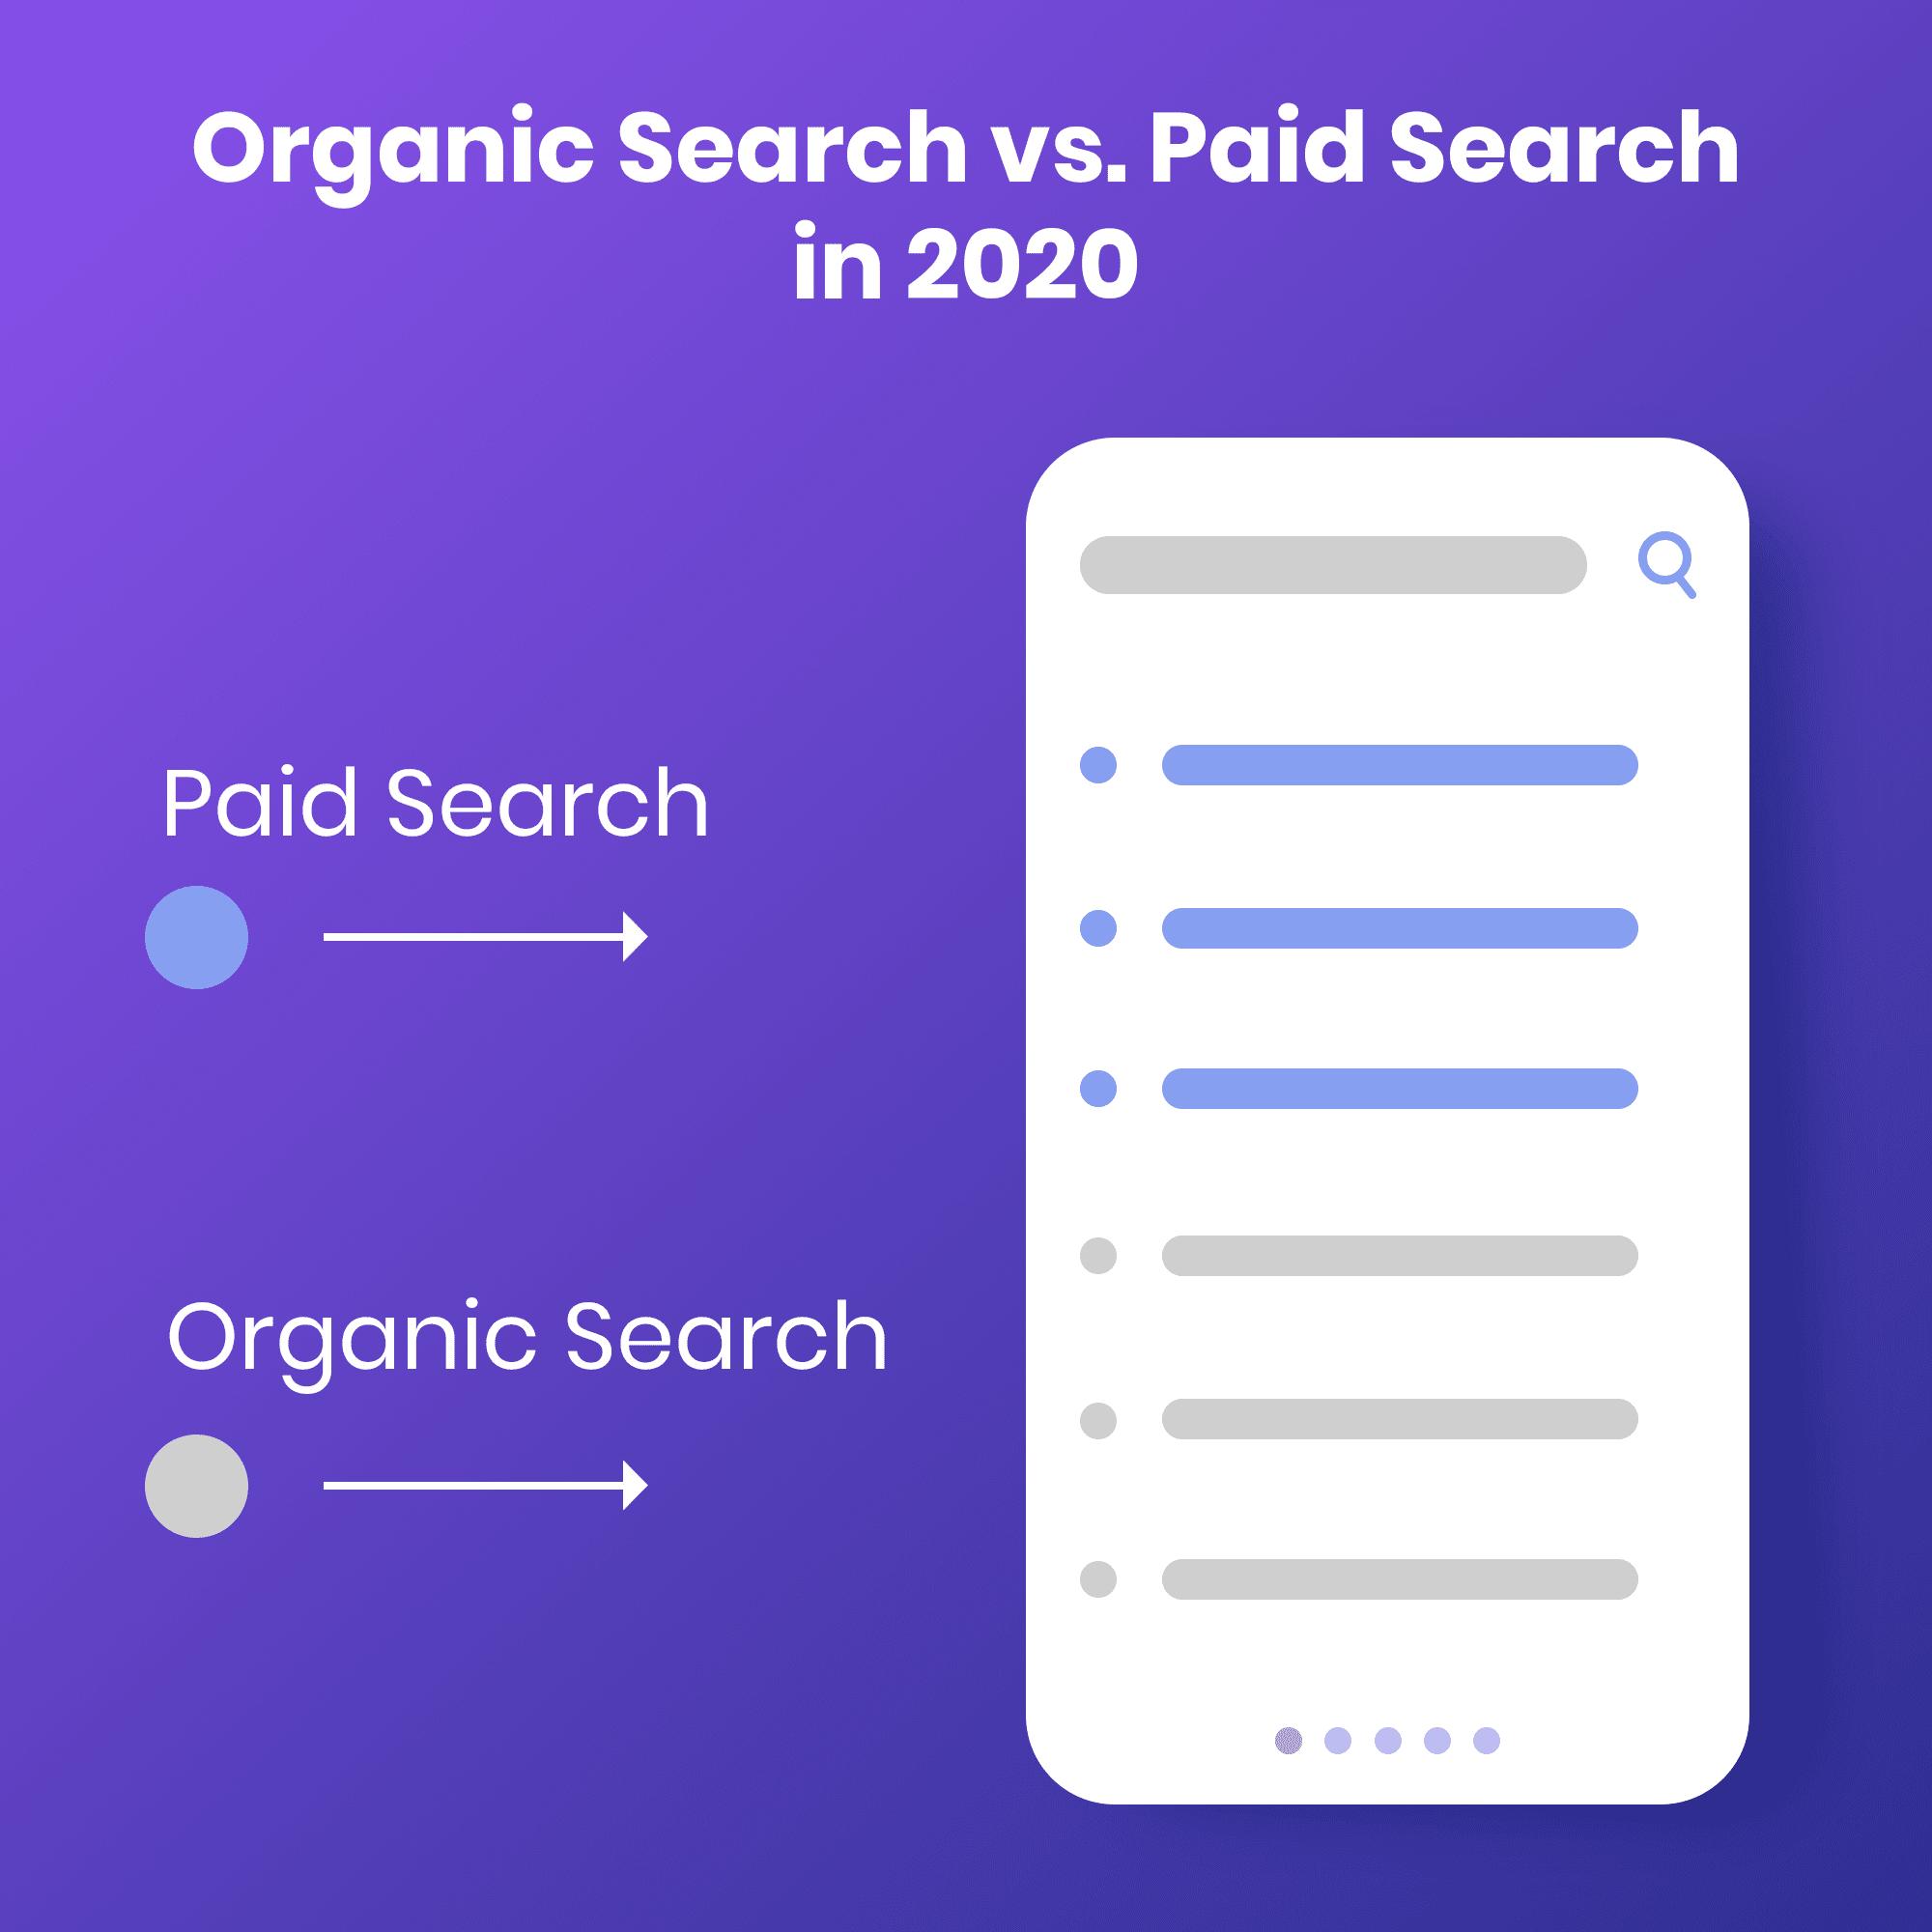 Organic Search vs. Paid Search